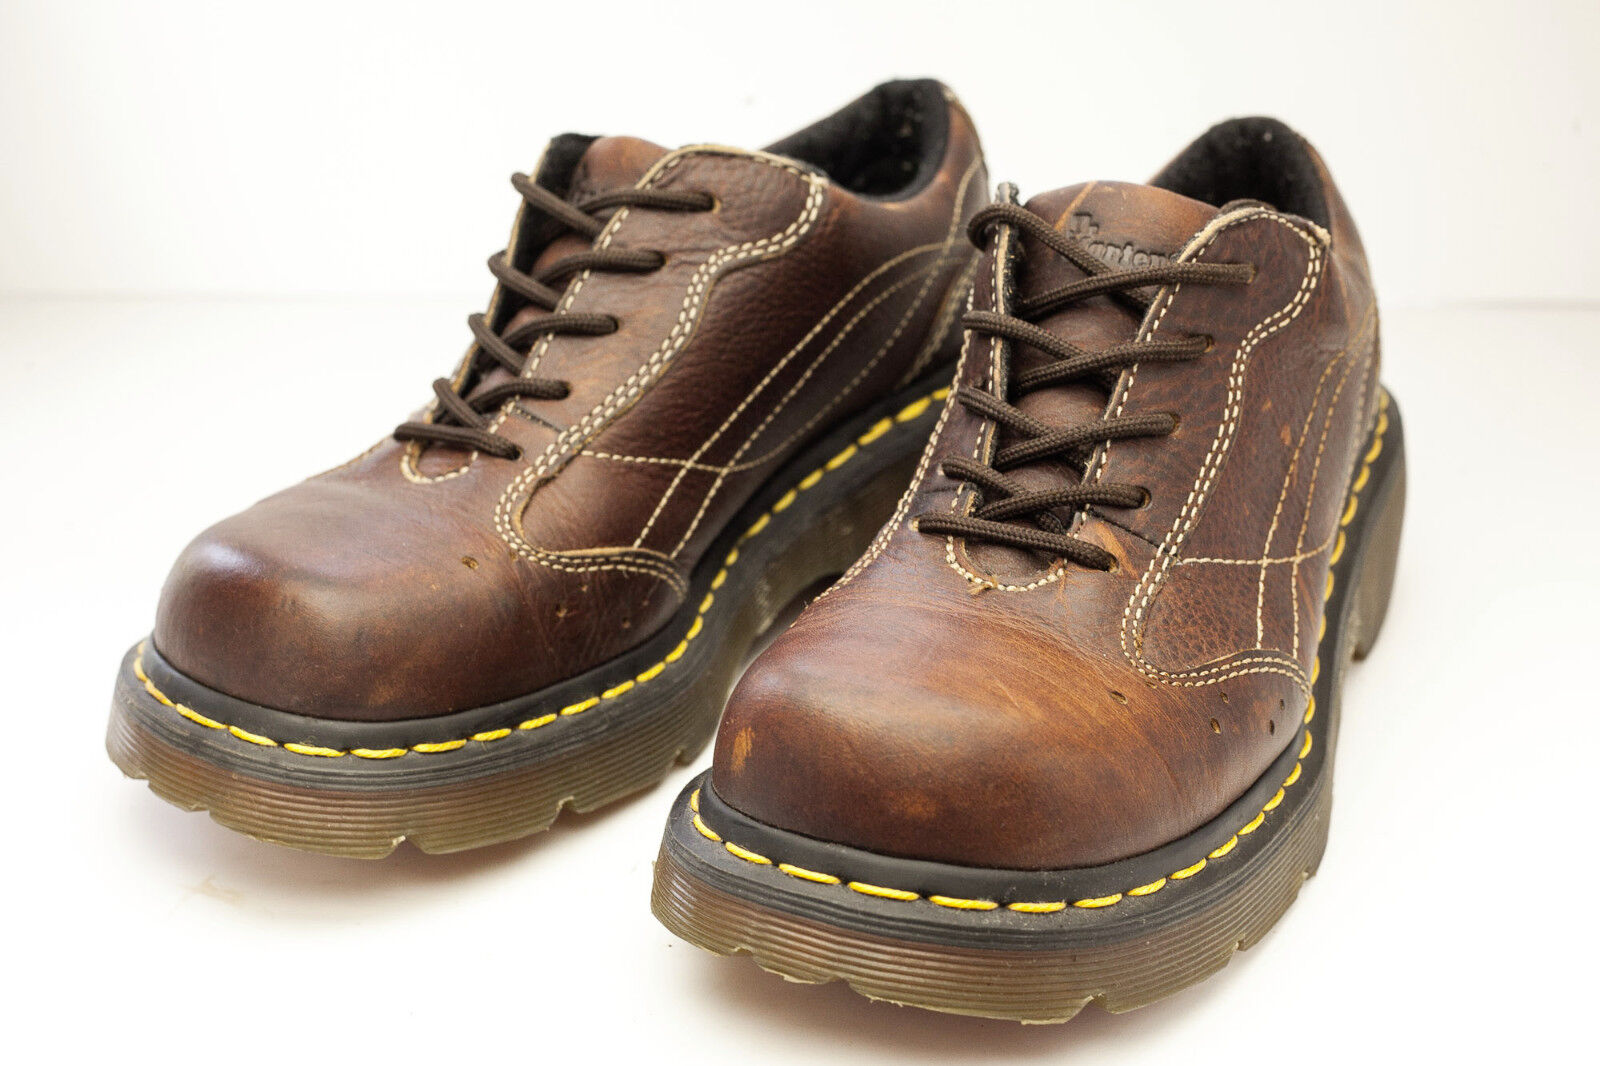 Dr Martens 8 Brown Oxfords Platform Women's shoes